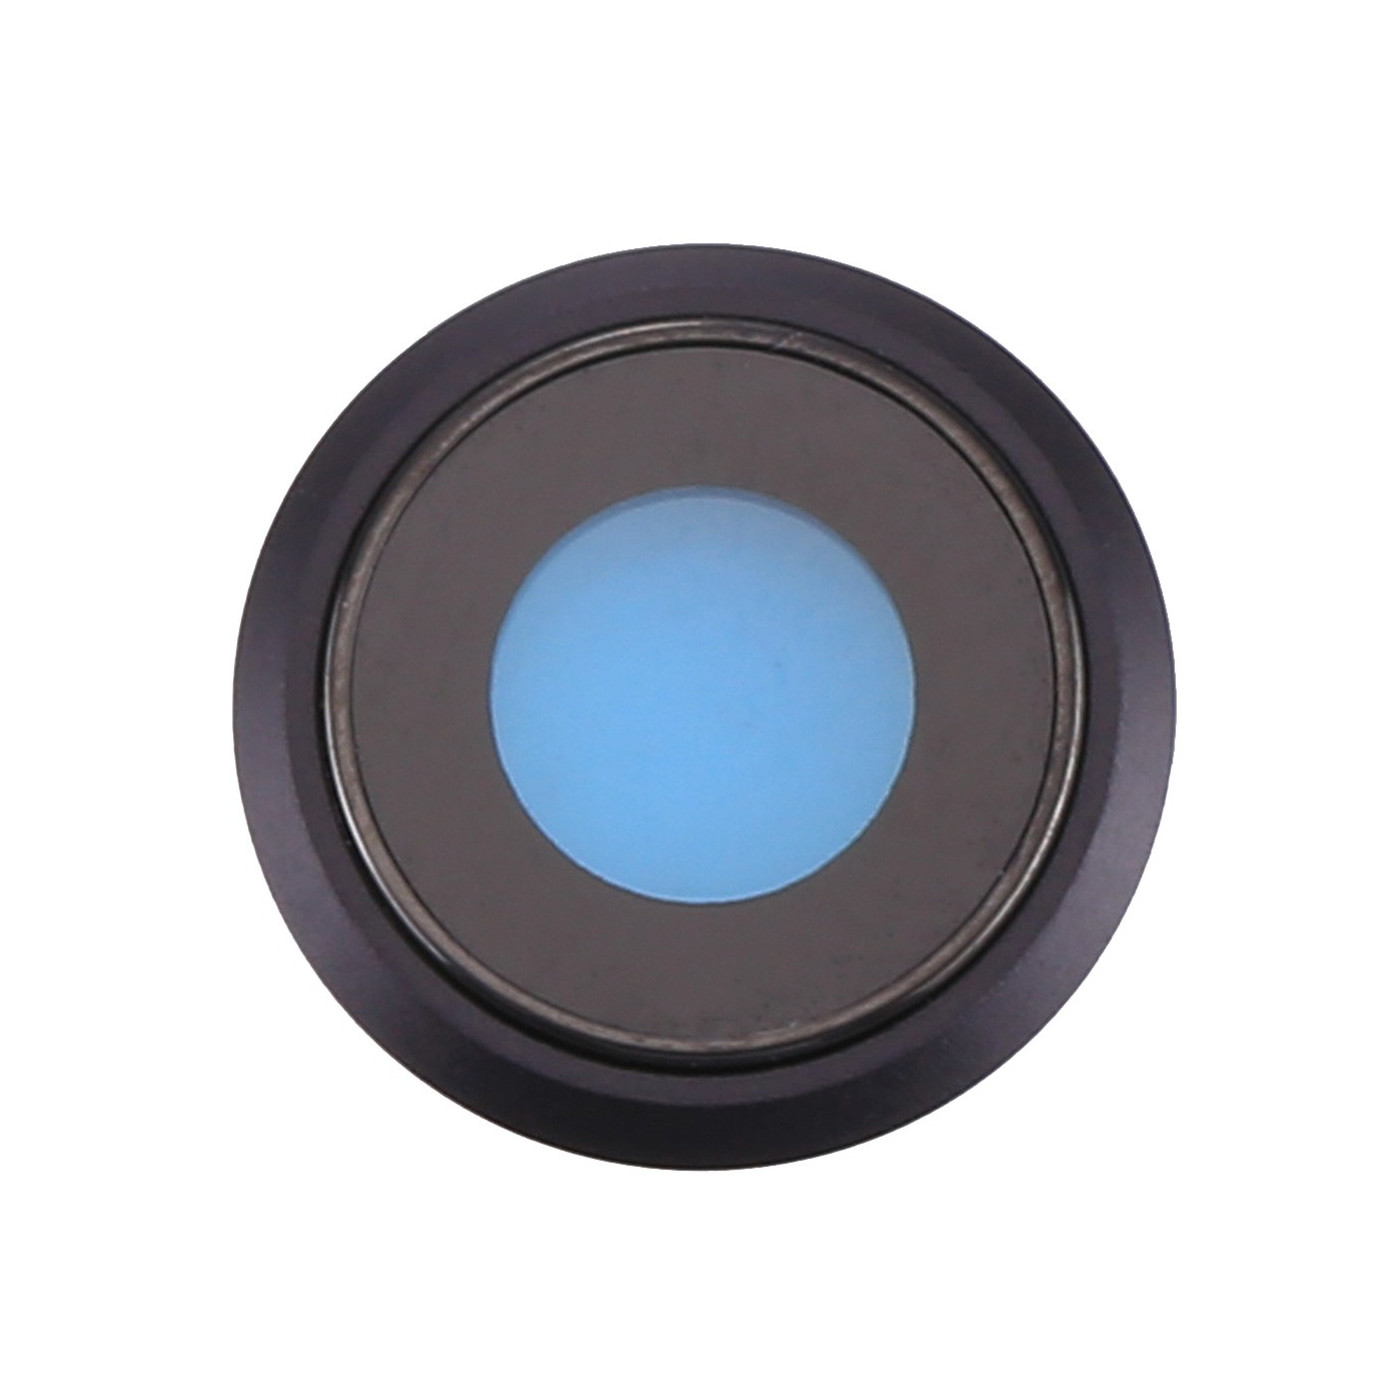 Kameraobjektiv IPHONE 8 BLACK COVER + GLAS OBJEKTIV FÜR HINTERE KAMERA